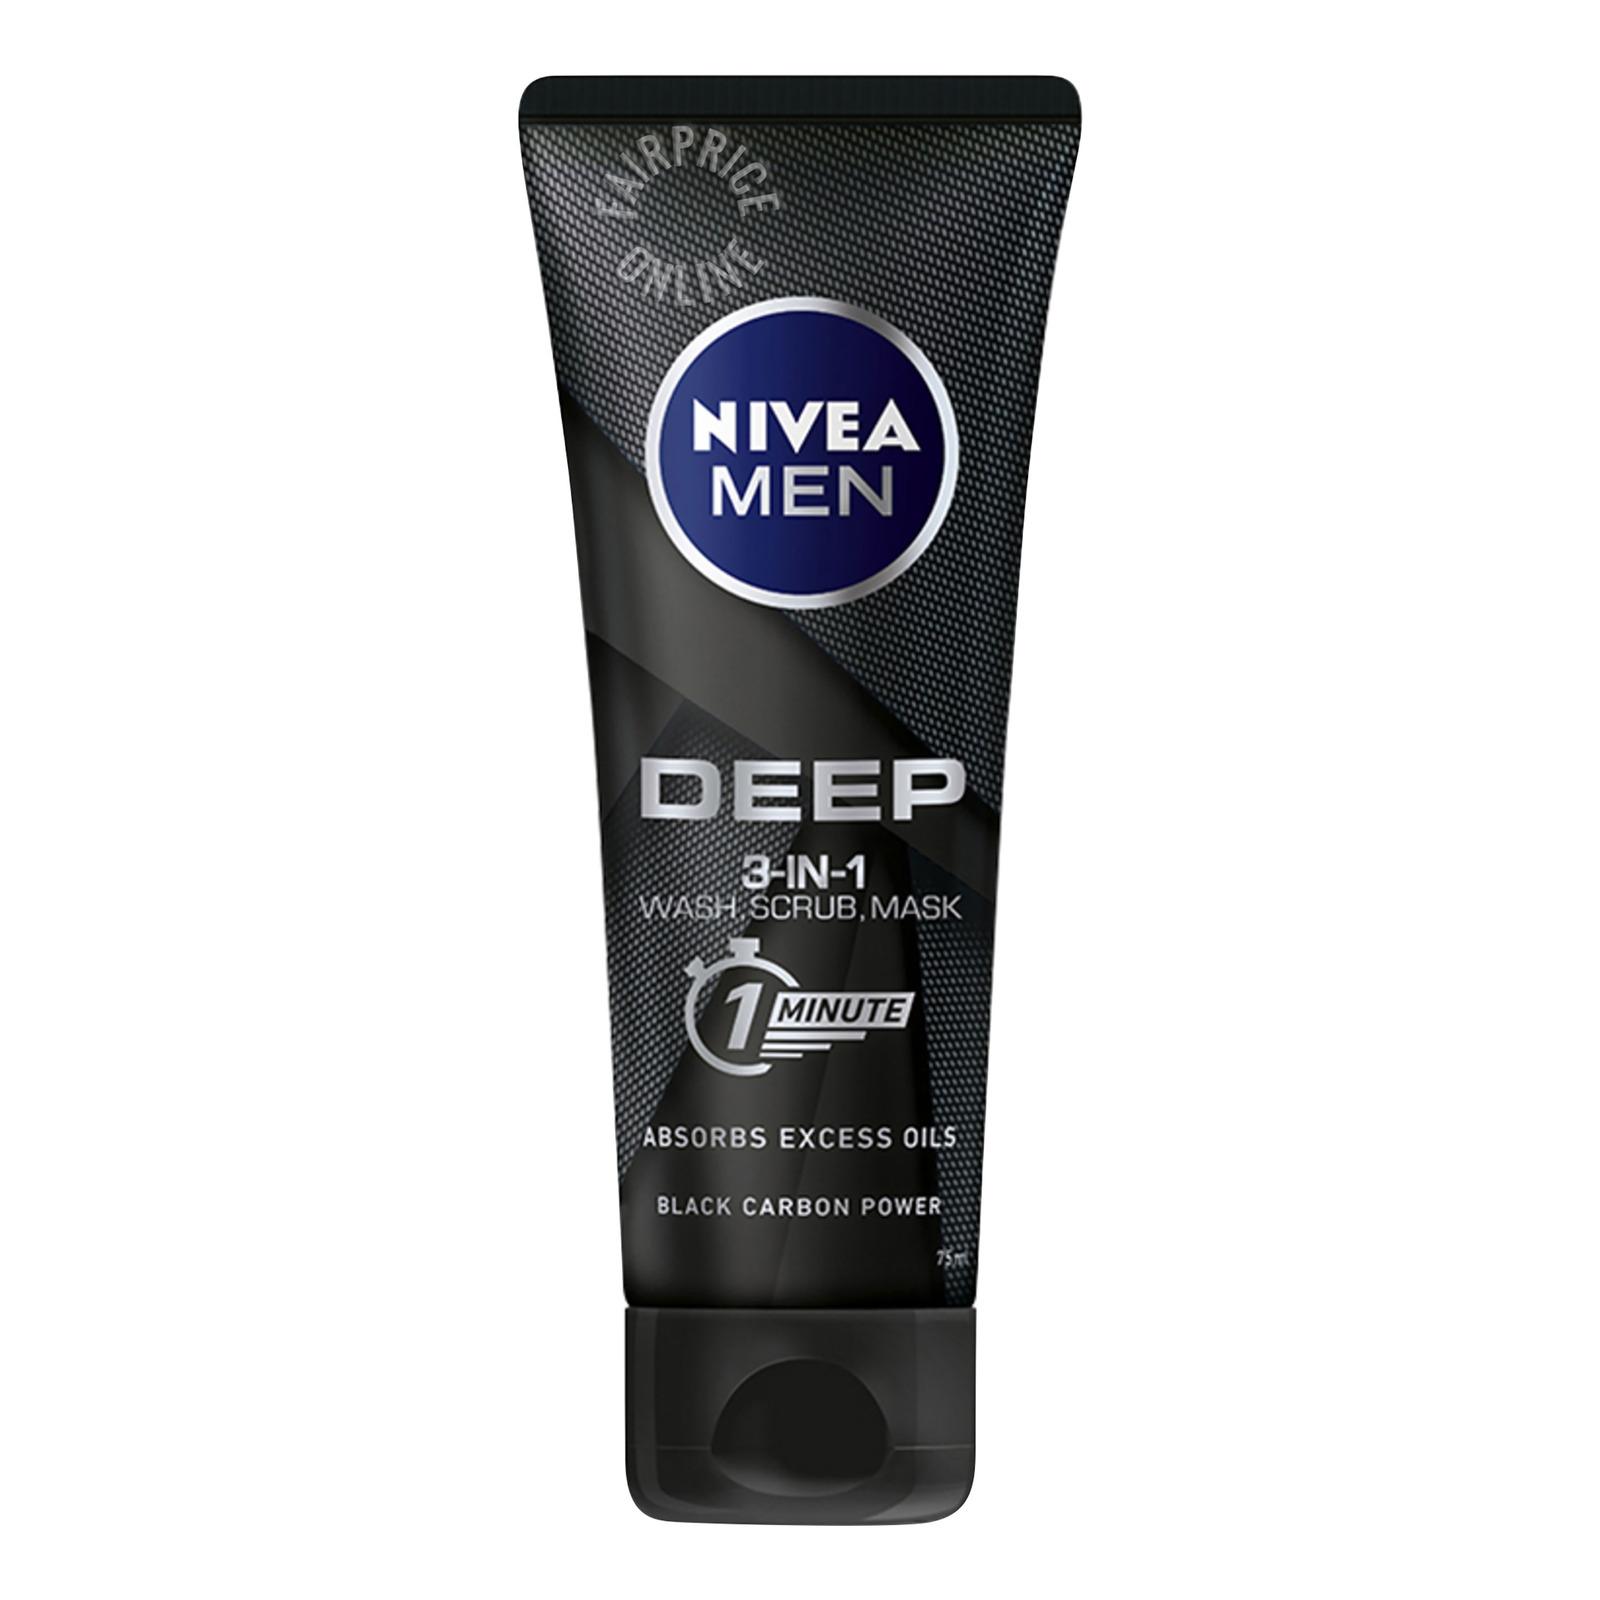 Nivea Men 3-in-1 Wash Scrub Mask - Deep